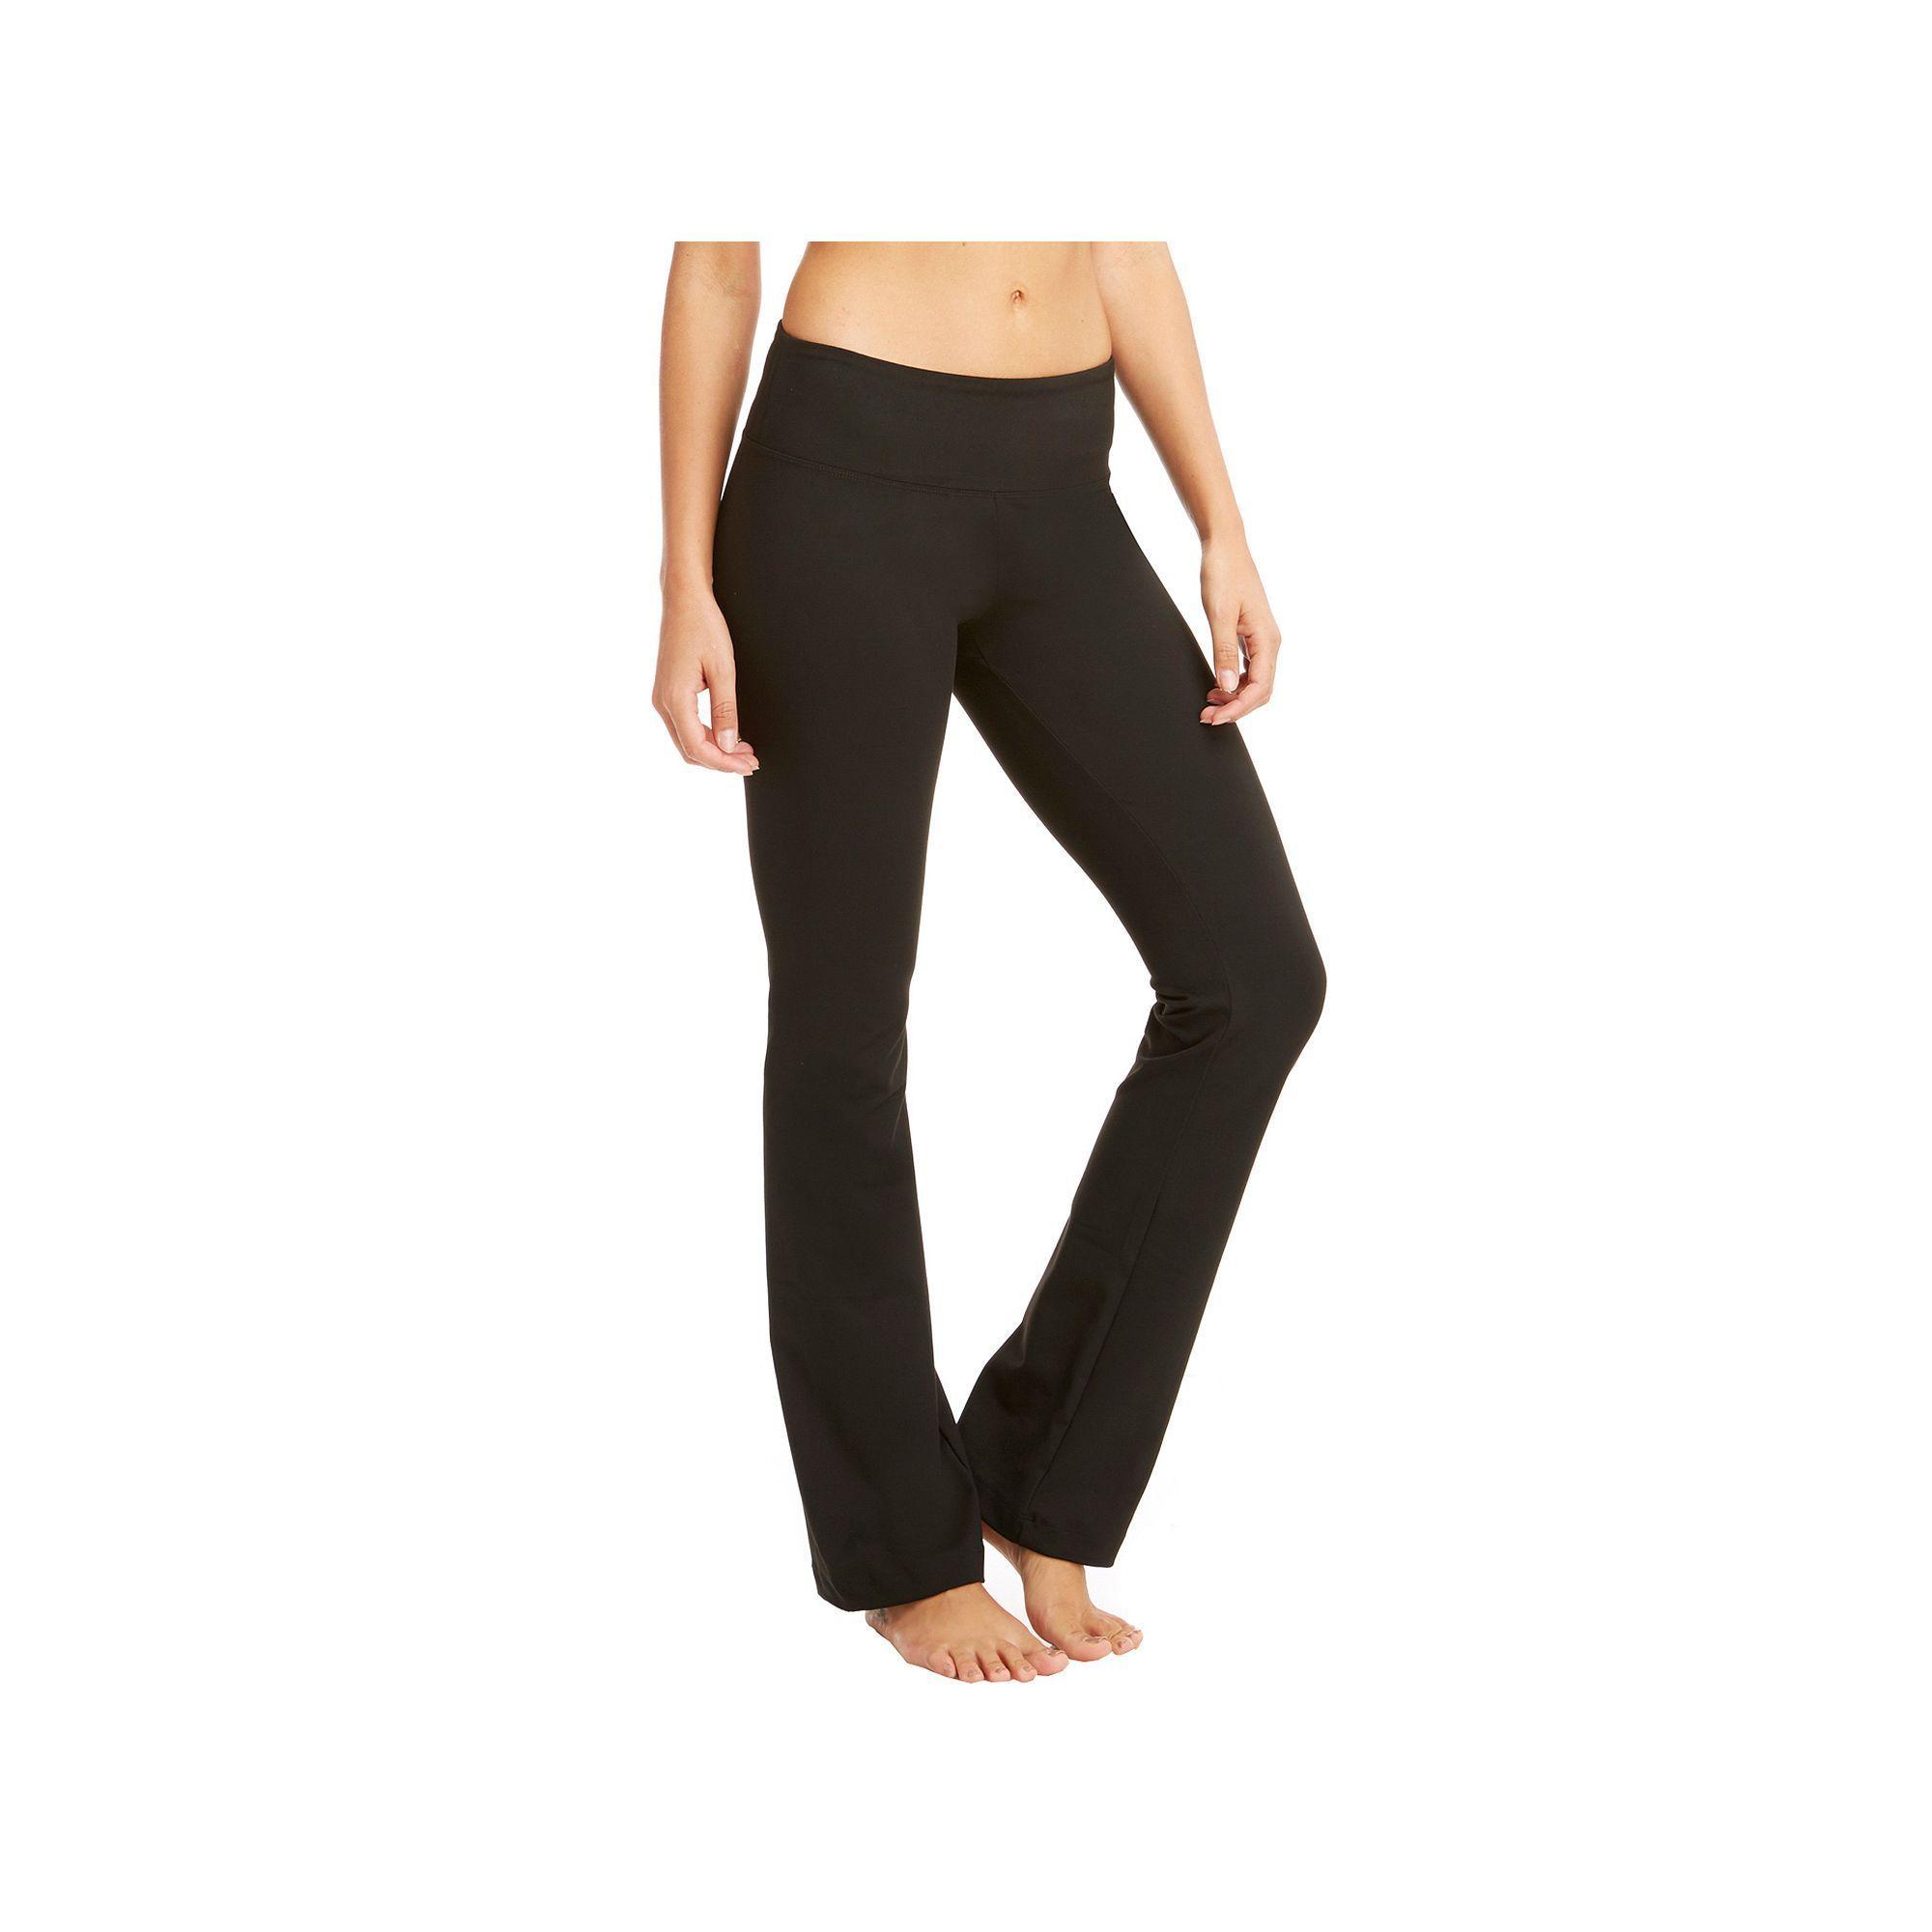 d0c1c751195a8e Women's Marika Weekend Sanded Dry Wik Flared Yoga Pants, Size: Medium, Black